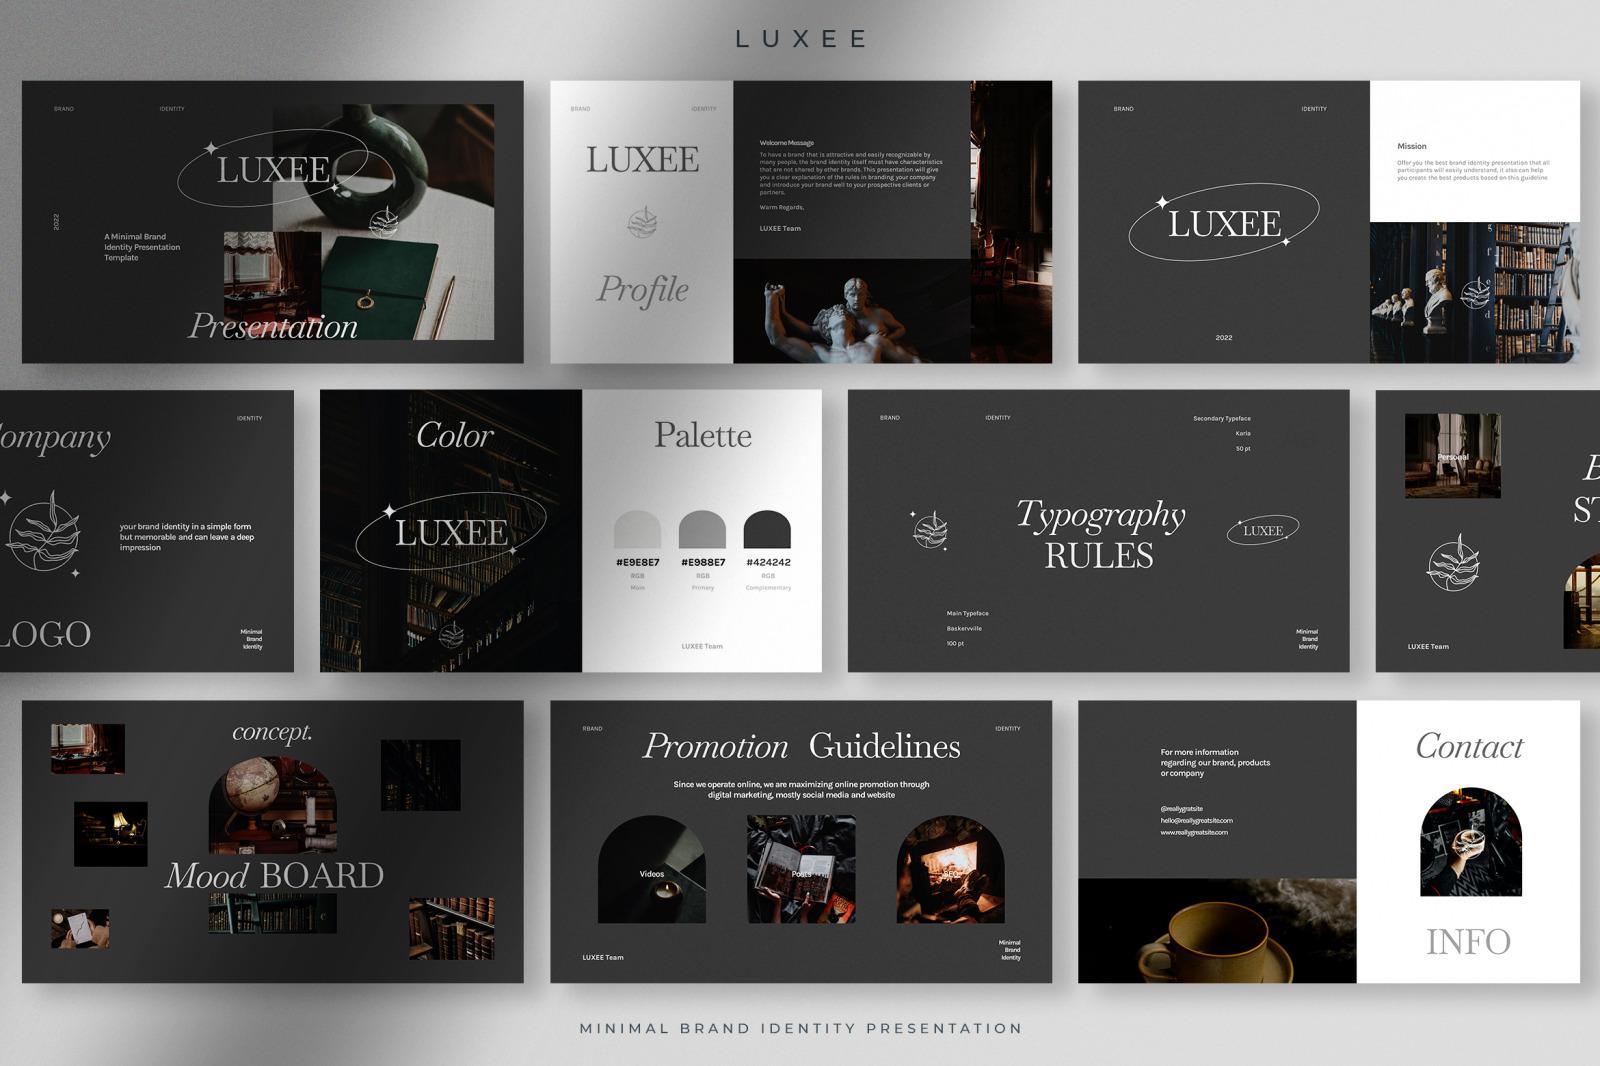 Luxee - Minimal Brand Identity Presentation